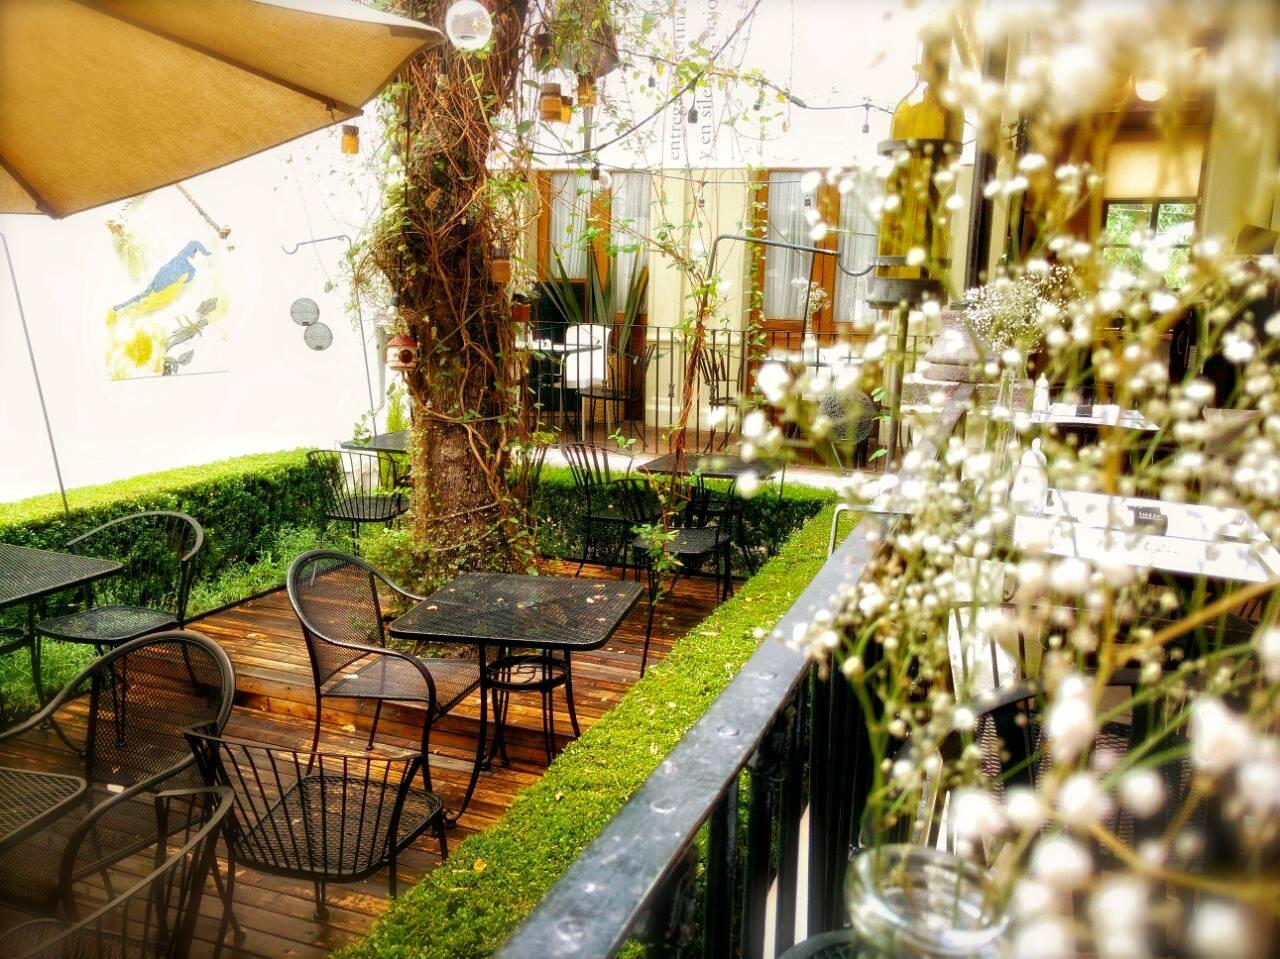 Cafeterías del centro histórico de Toluca